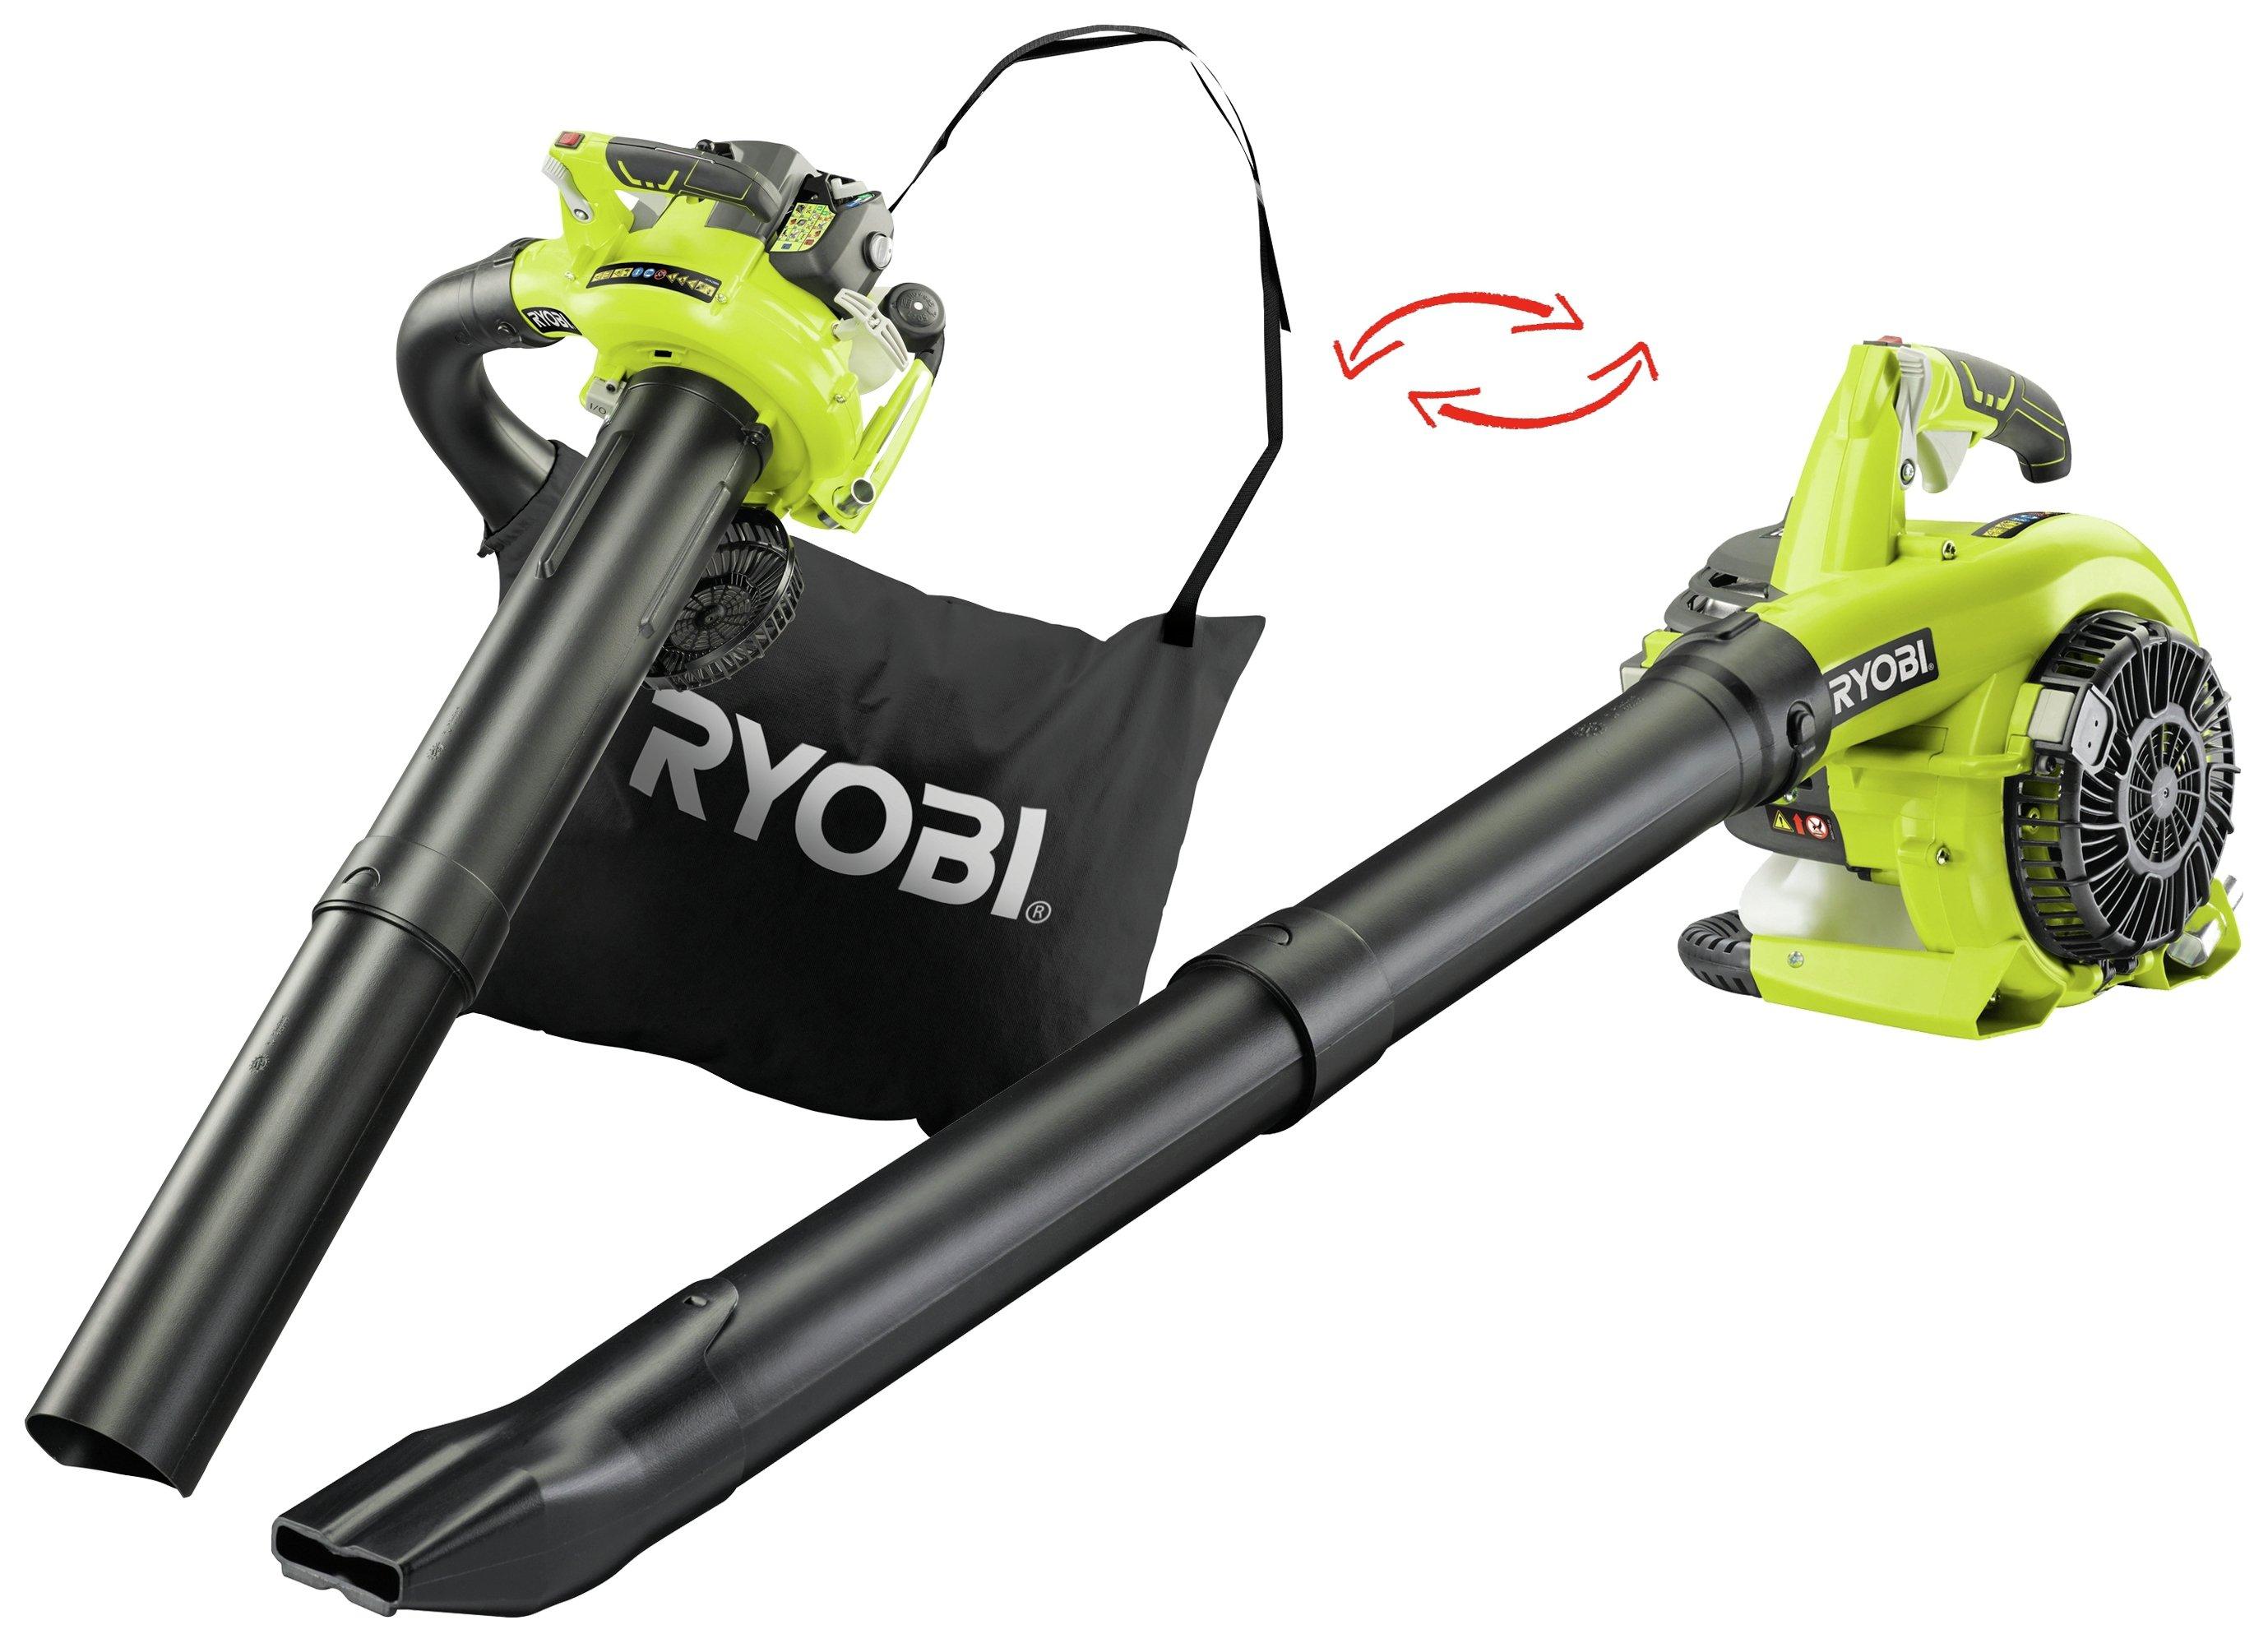 Ryobi - RBV26B Petrol Garden Vac - 26cc